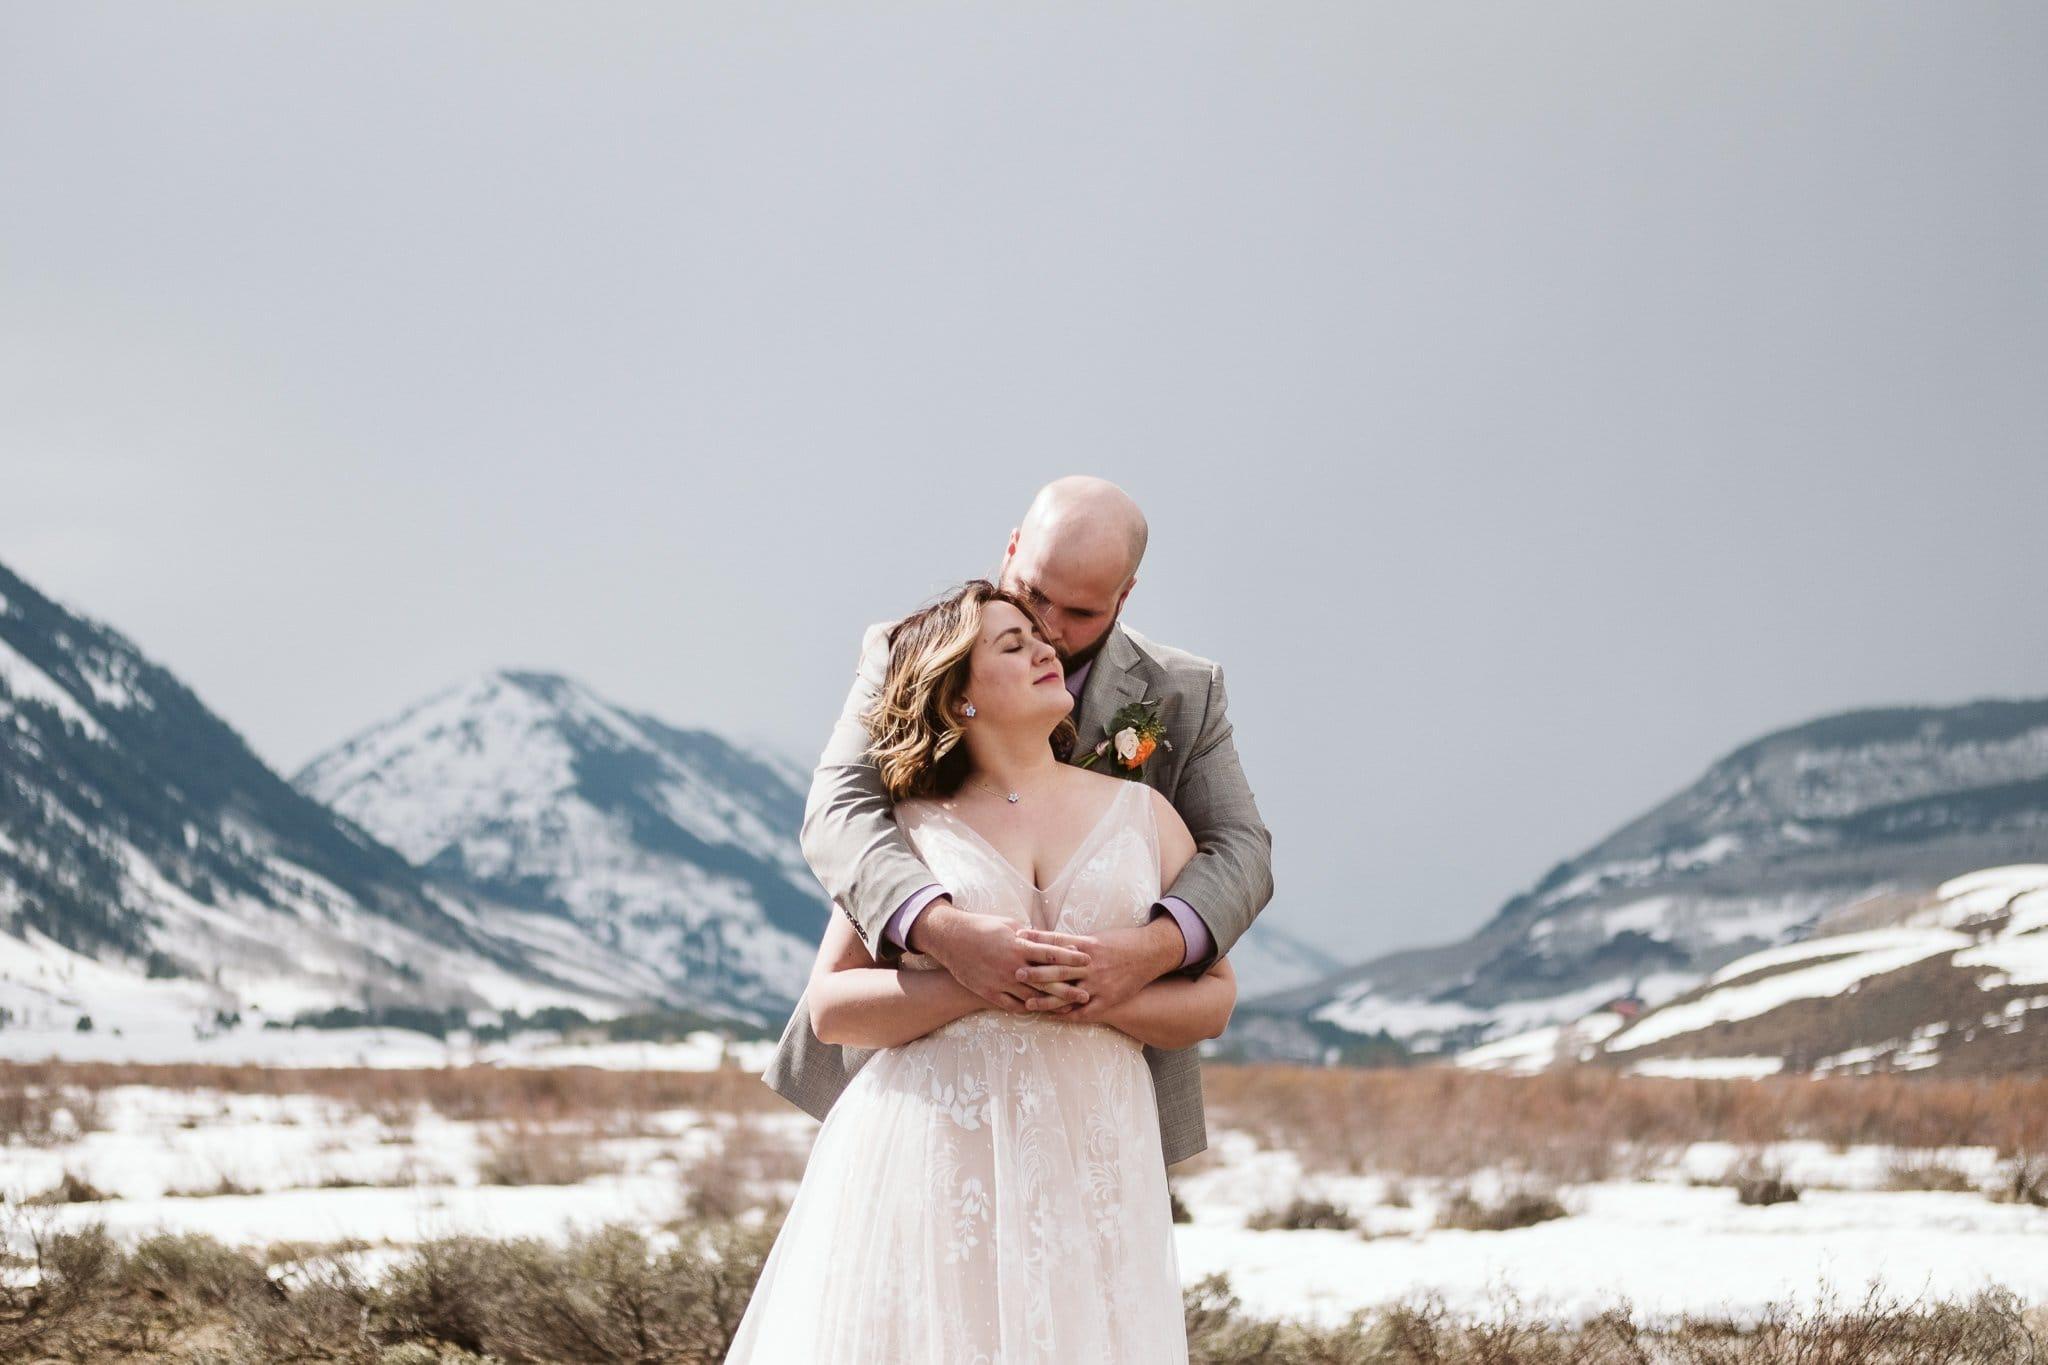 Crested Butte wedding photos in snow, winter mountain elopement, bride wearing blush wedding gown